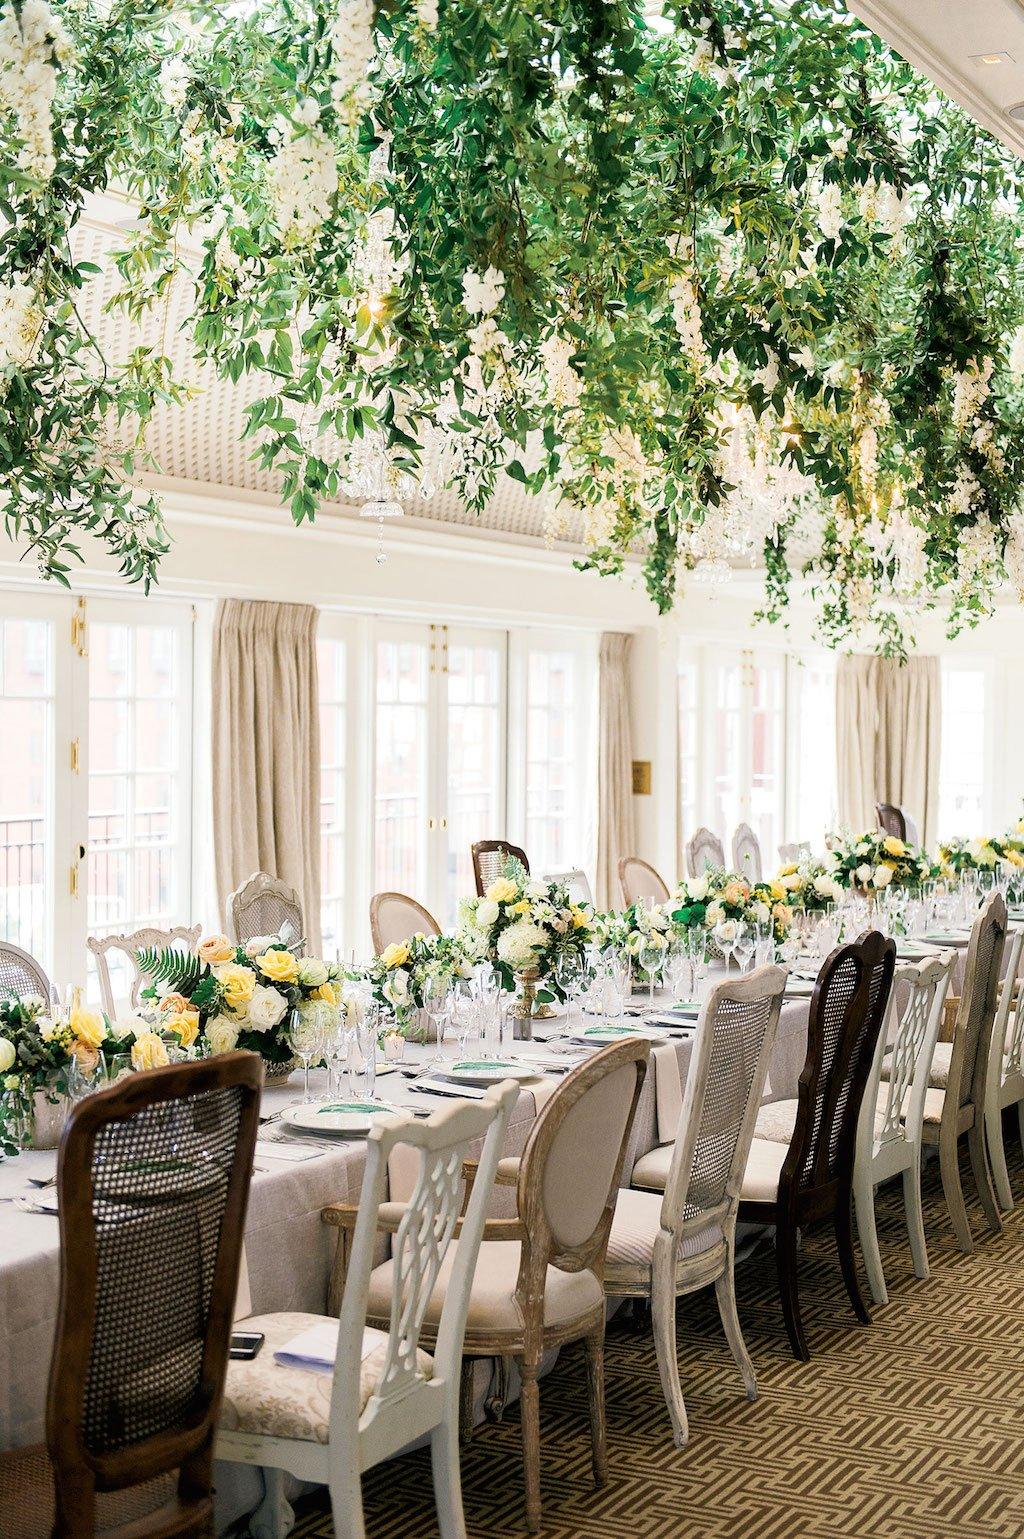 10-11-16-coolest-wedding-decor-design-2